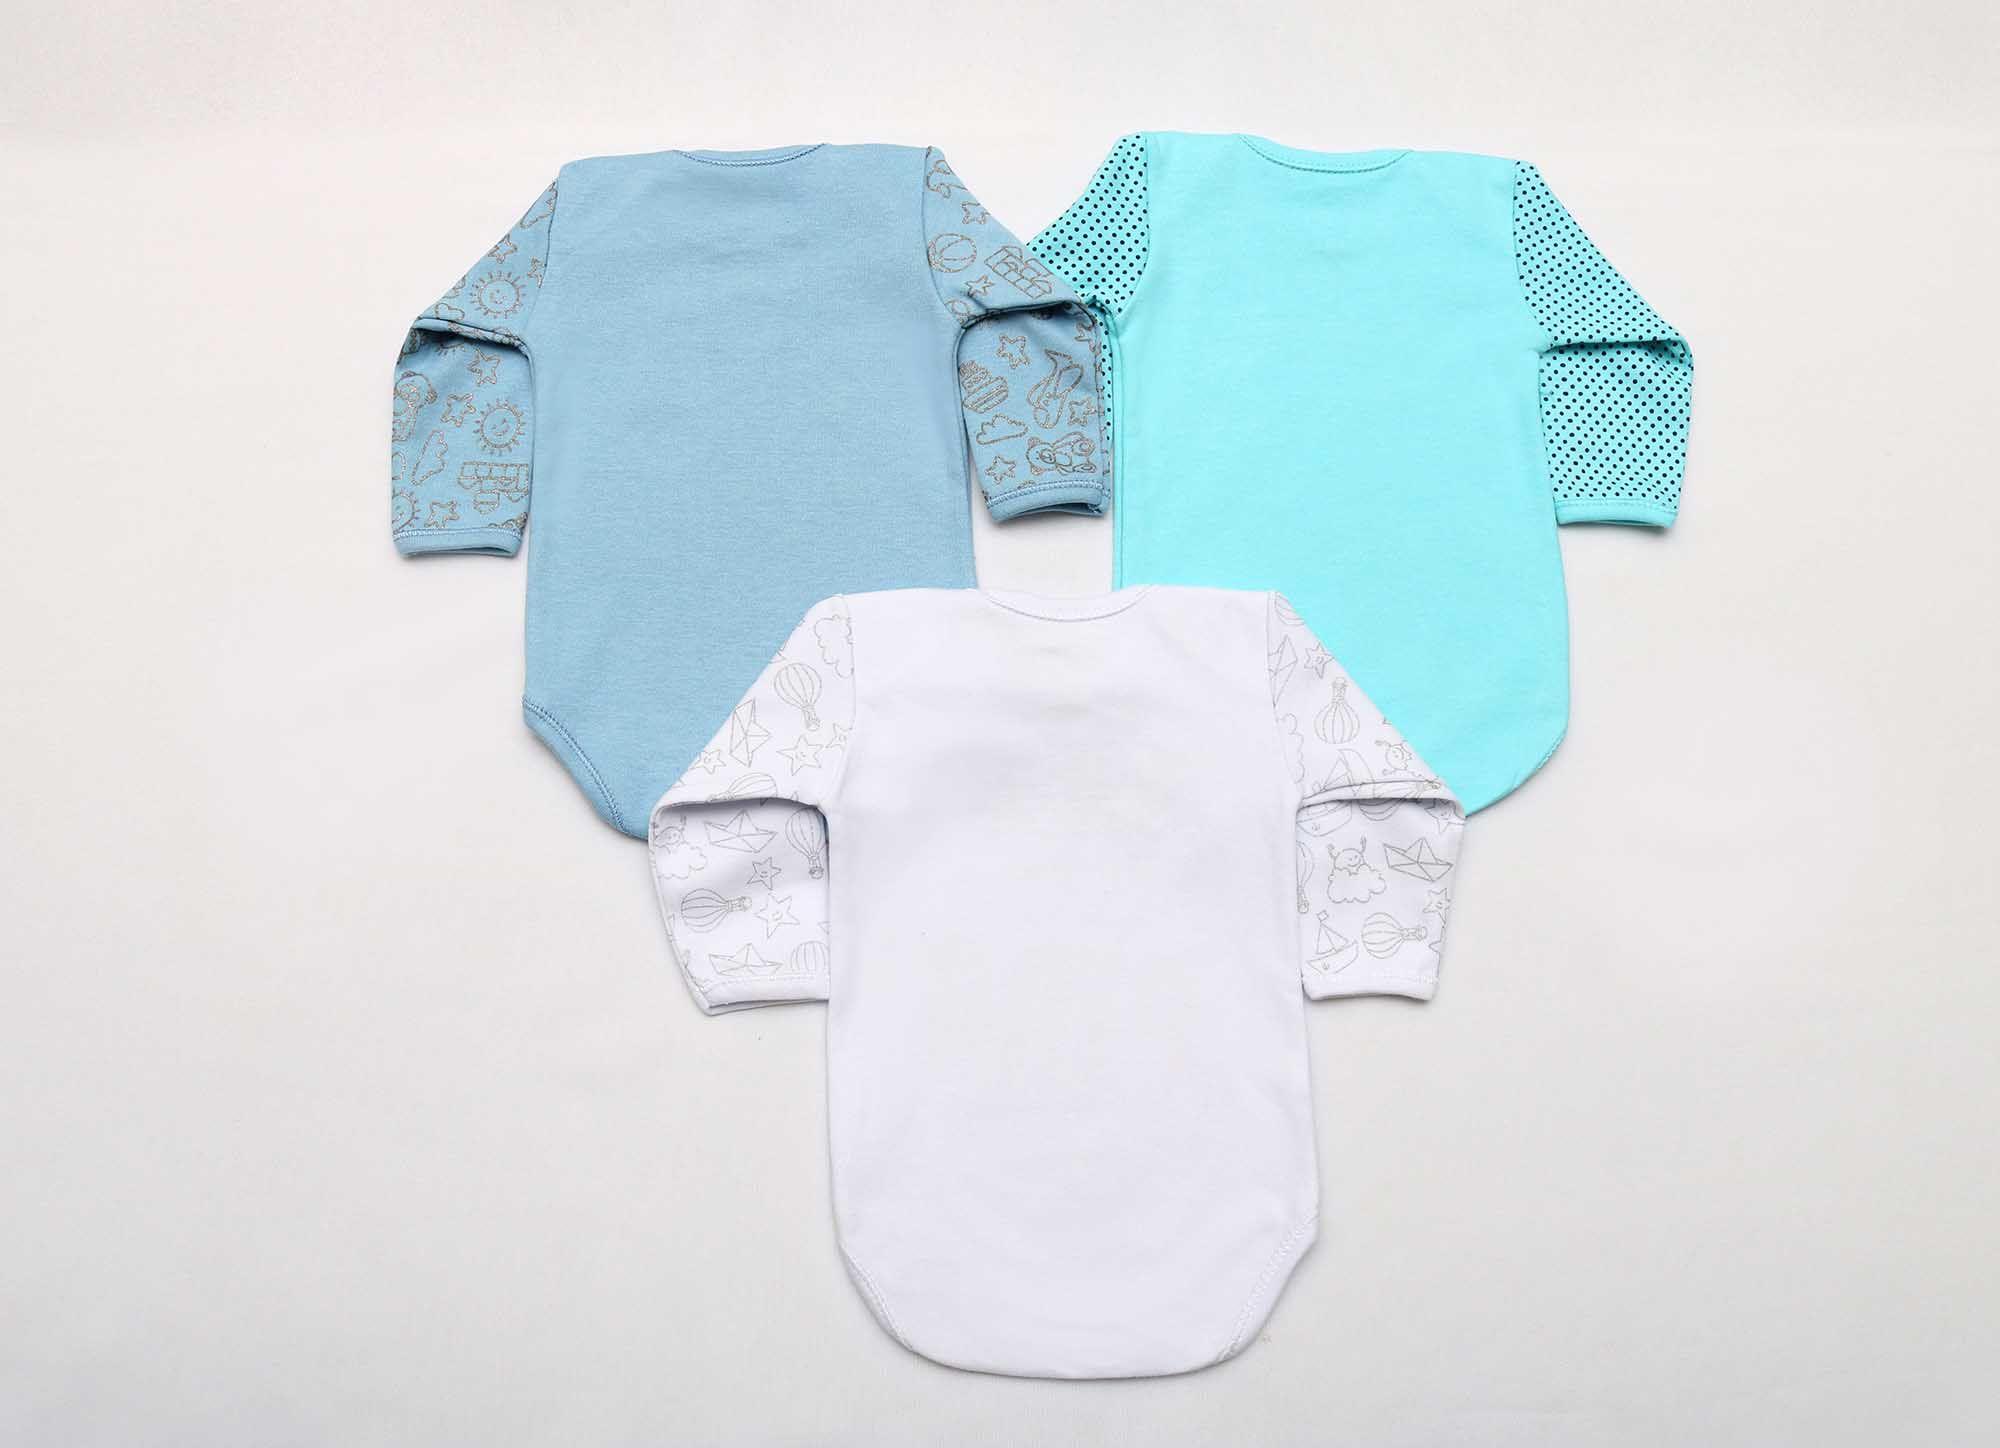 Kit Body Bebê 3 Peças Menino Branco e Azul Titia